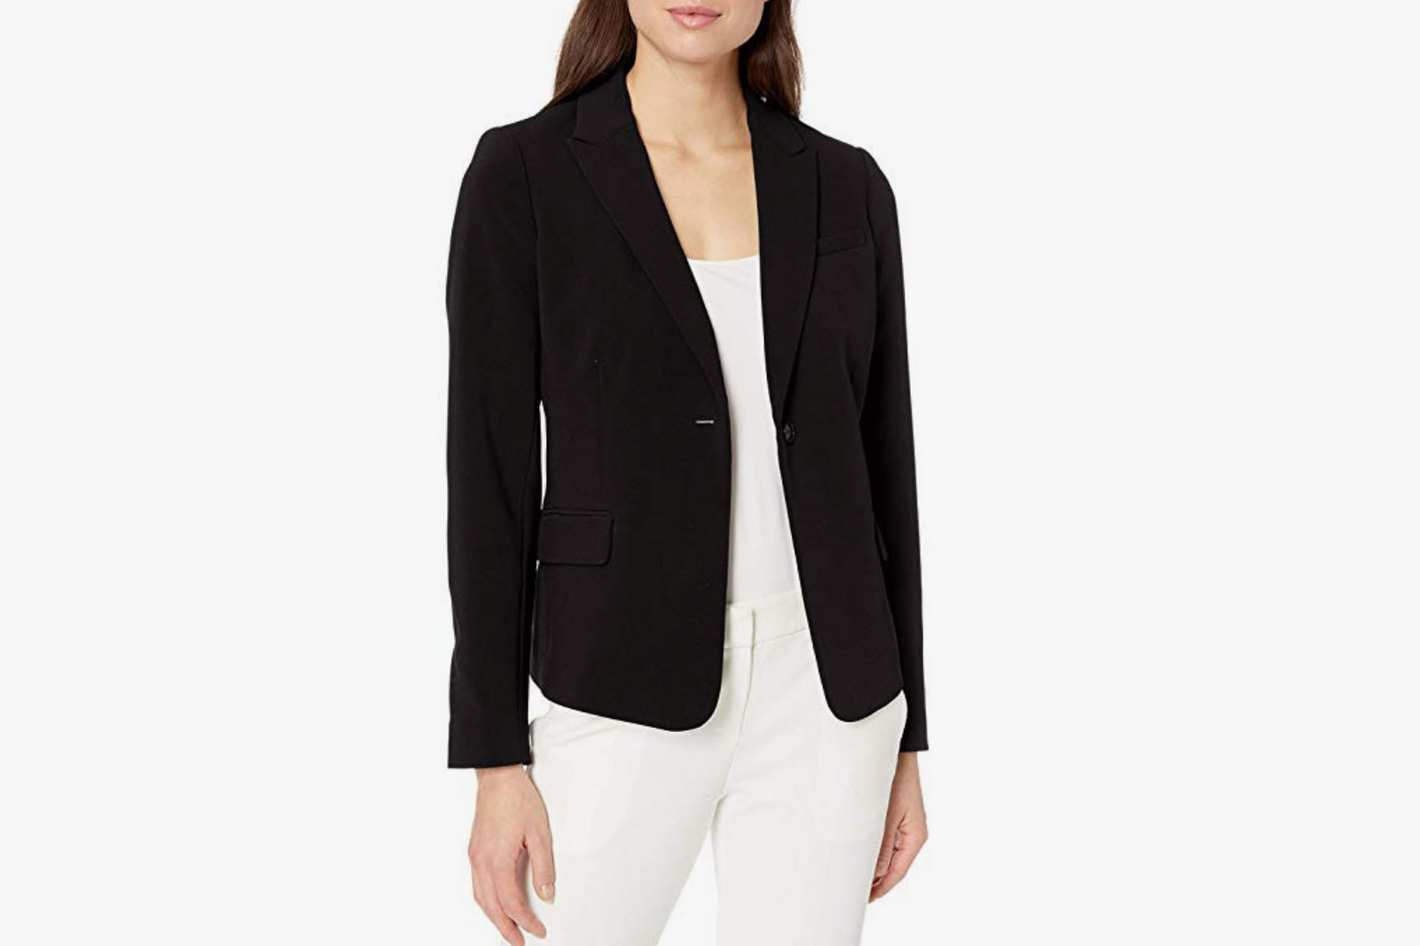 Lark & Ro Women's Classic One Button Blazer